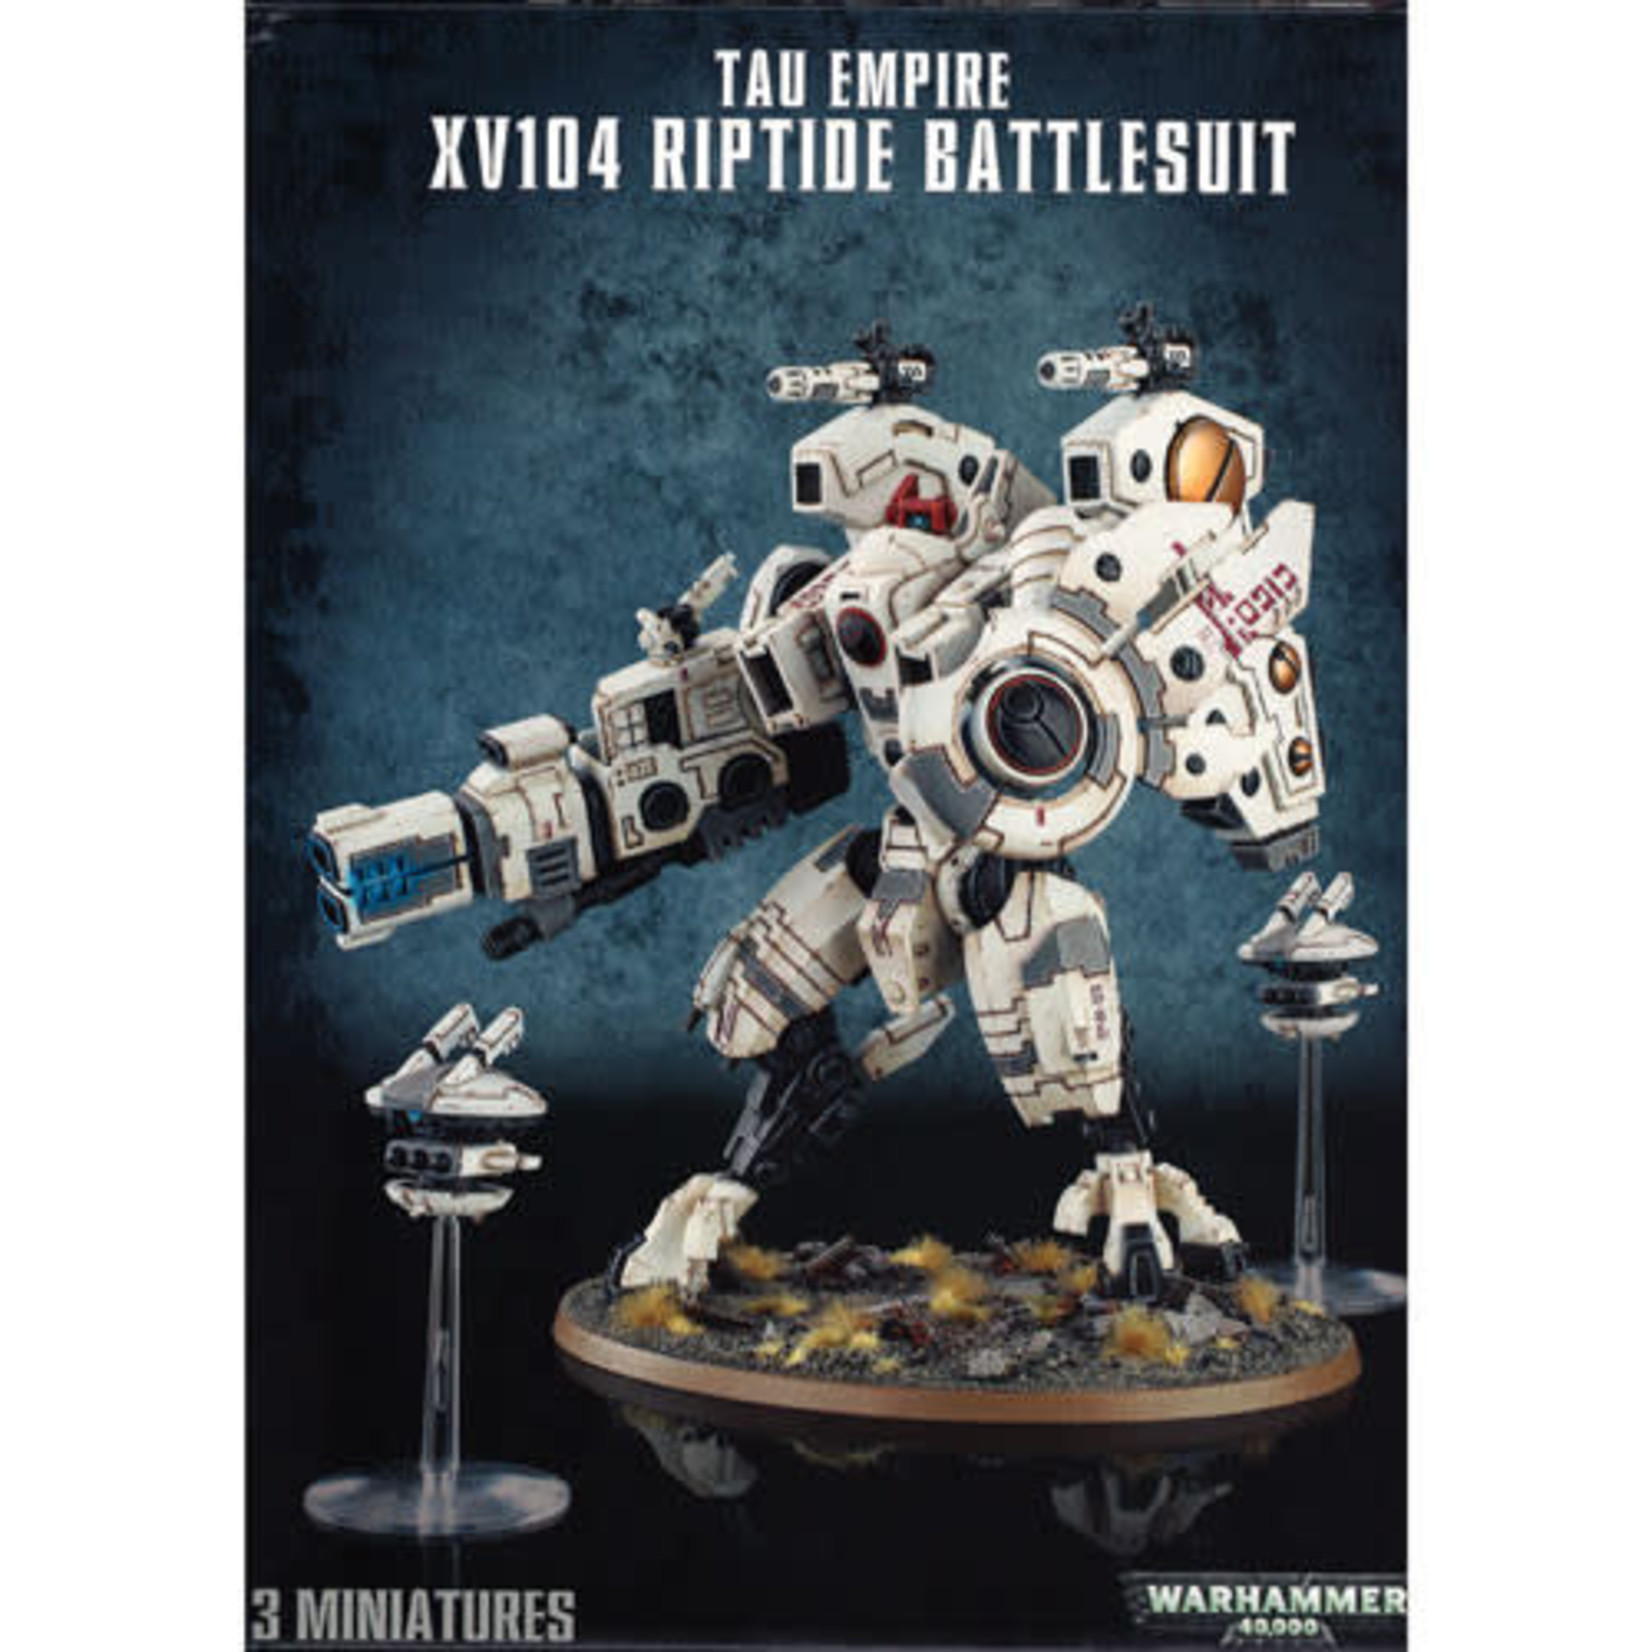 Tau Empire XV104 Riptide Battlesuit (40K)